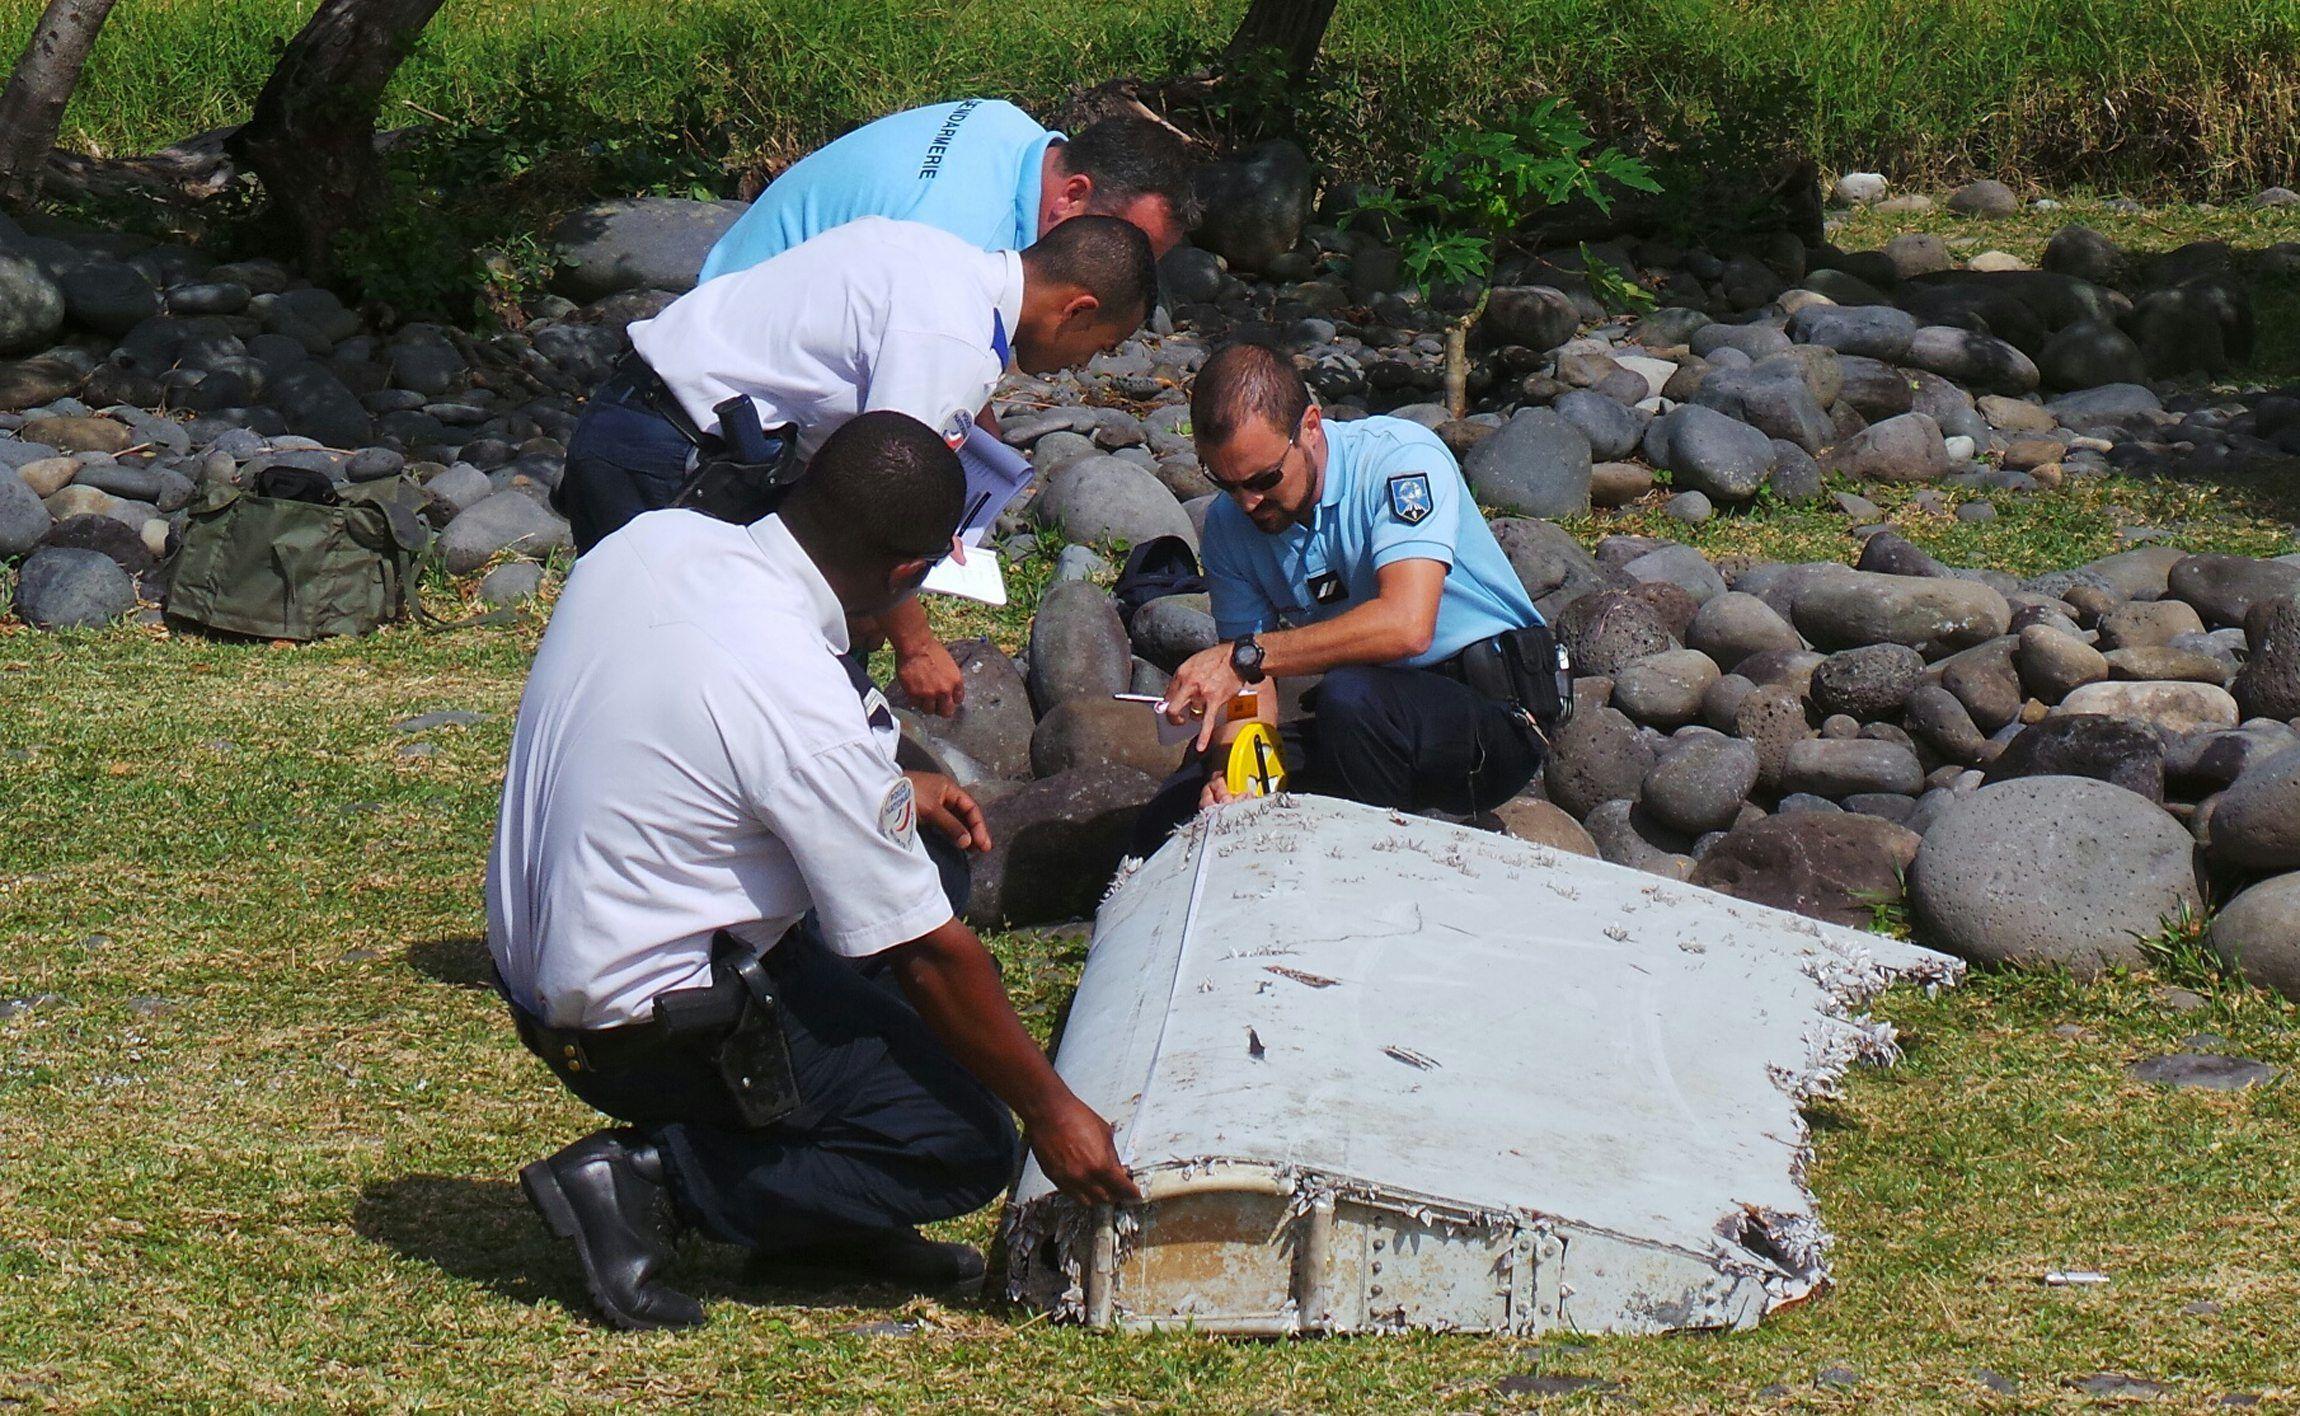 MH370 debris found on island of La Reunion